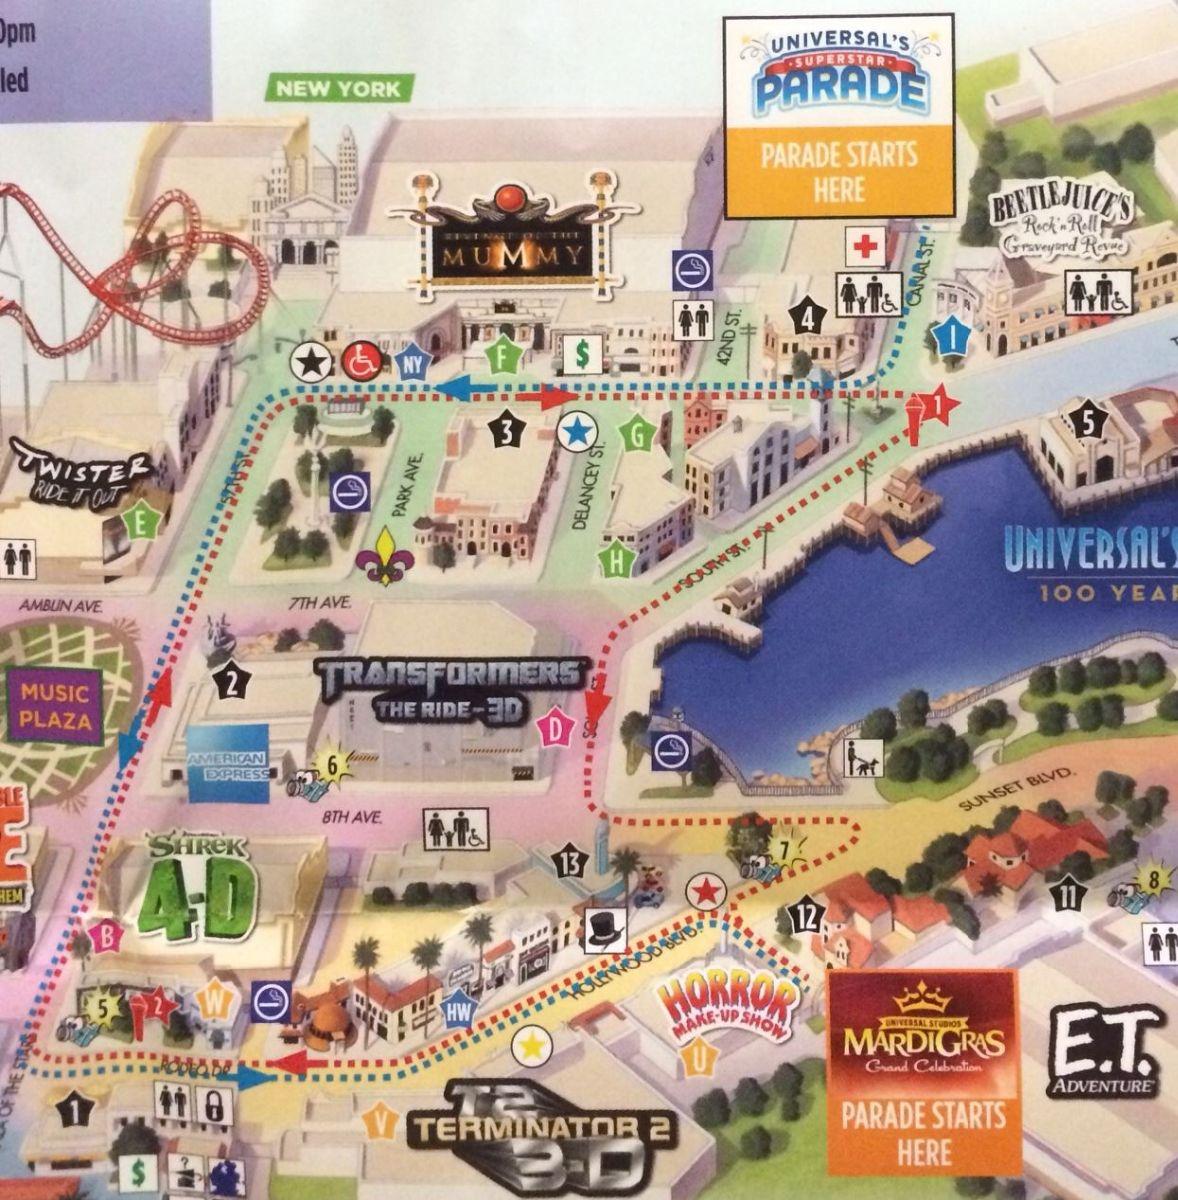 Universal Studios Florida Mardi Gras 2014 Parade Video